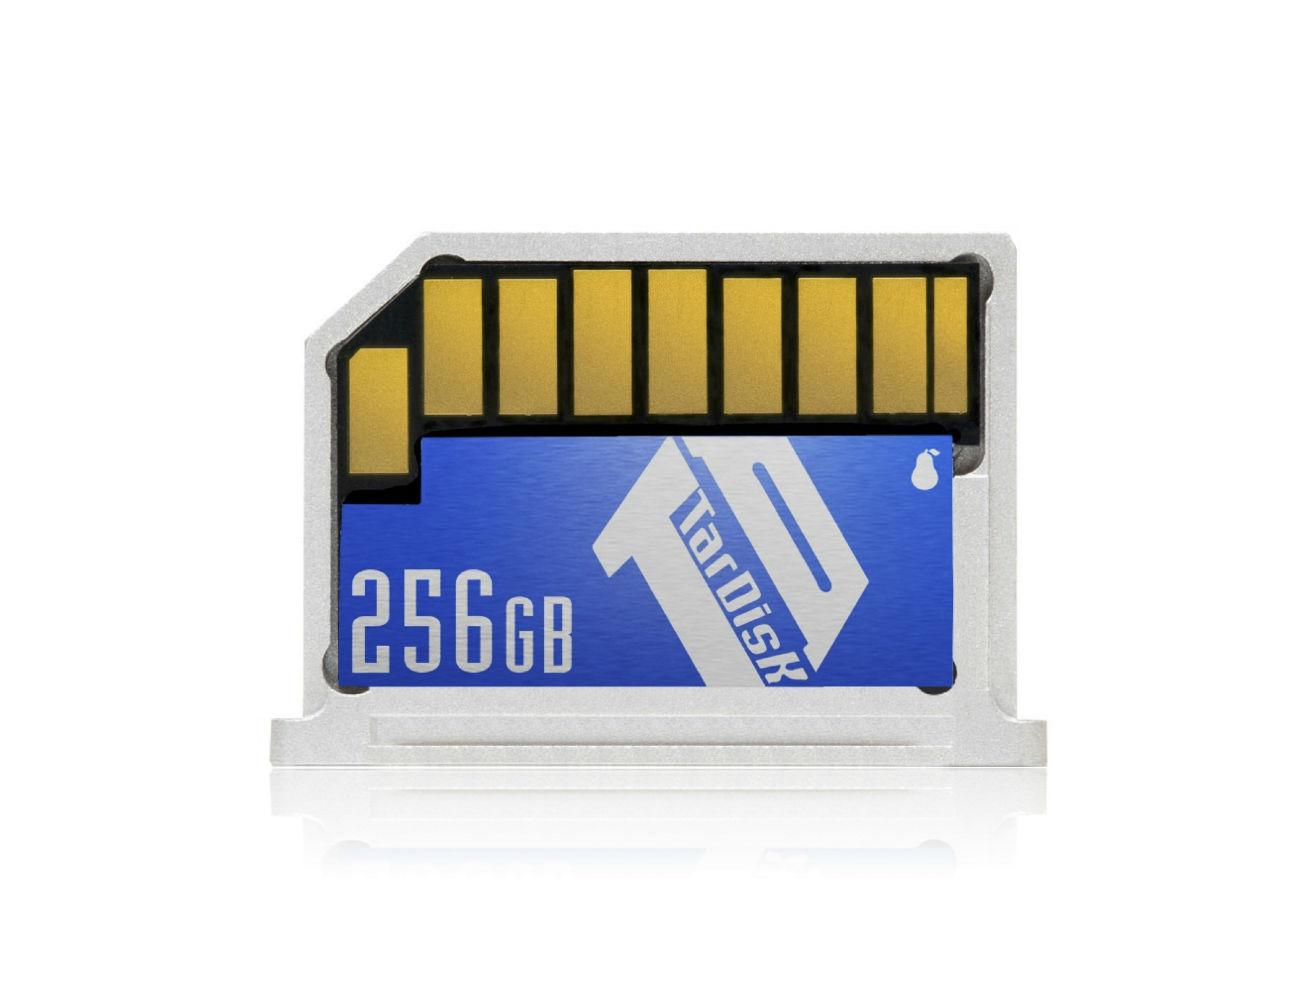 TarDisk Pear – Double Macbook Storage